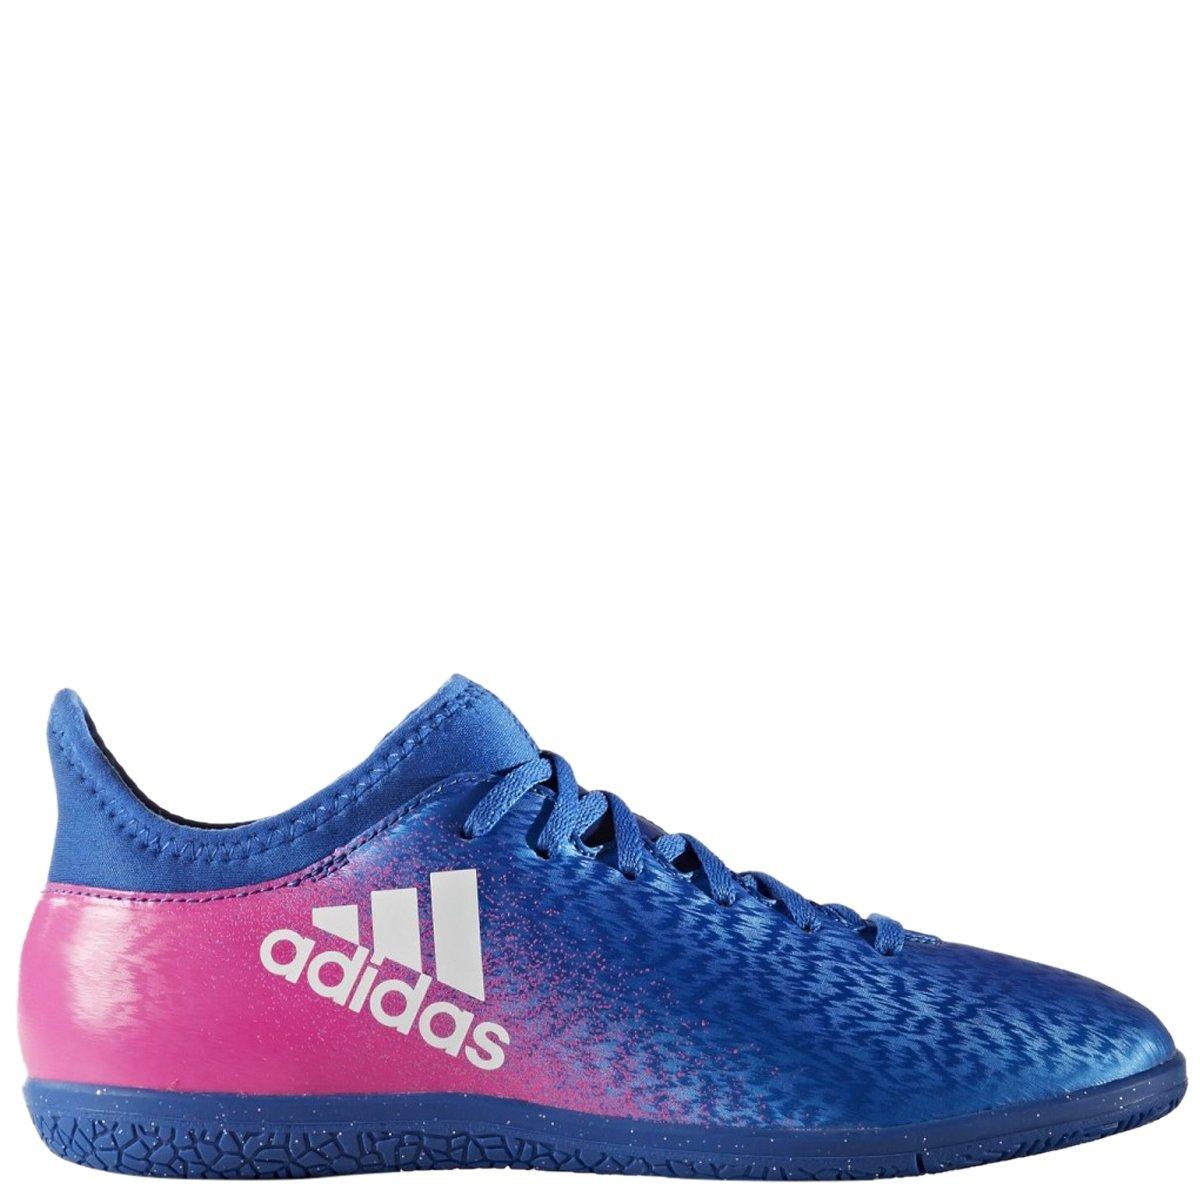 91433820ad4 Bizz Store - Chuteira Infantil Menino Futsal Adidas X 16.3 IN Junior